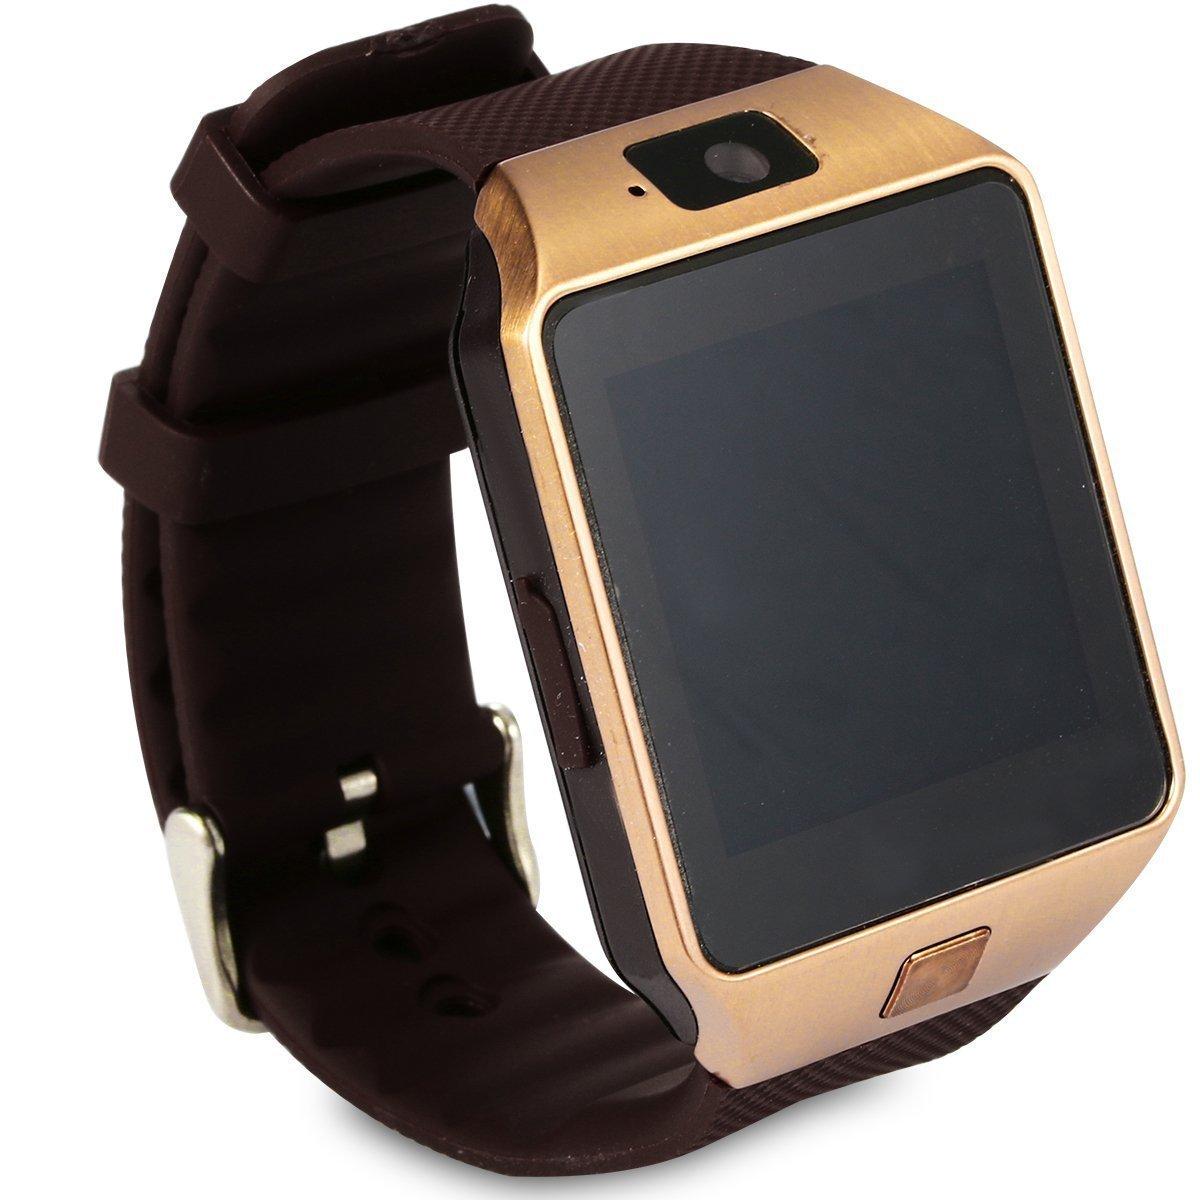 9801f882a95 DZ09 Bluetooth Smart Watch with SIM Card Slot Make  Amazon.co.uk   Electronics